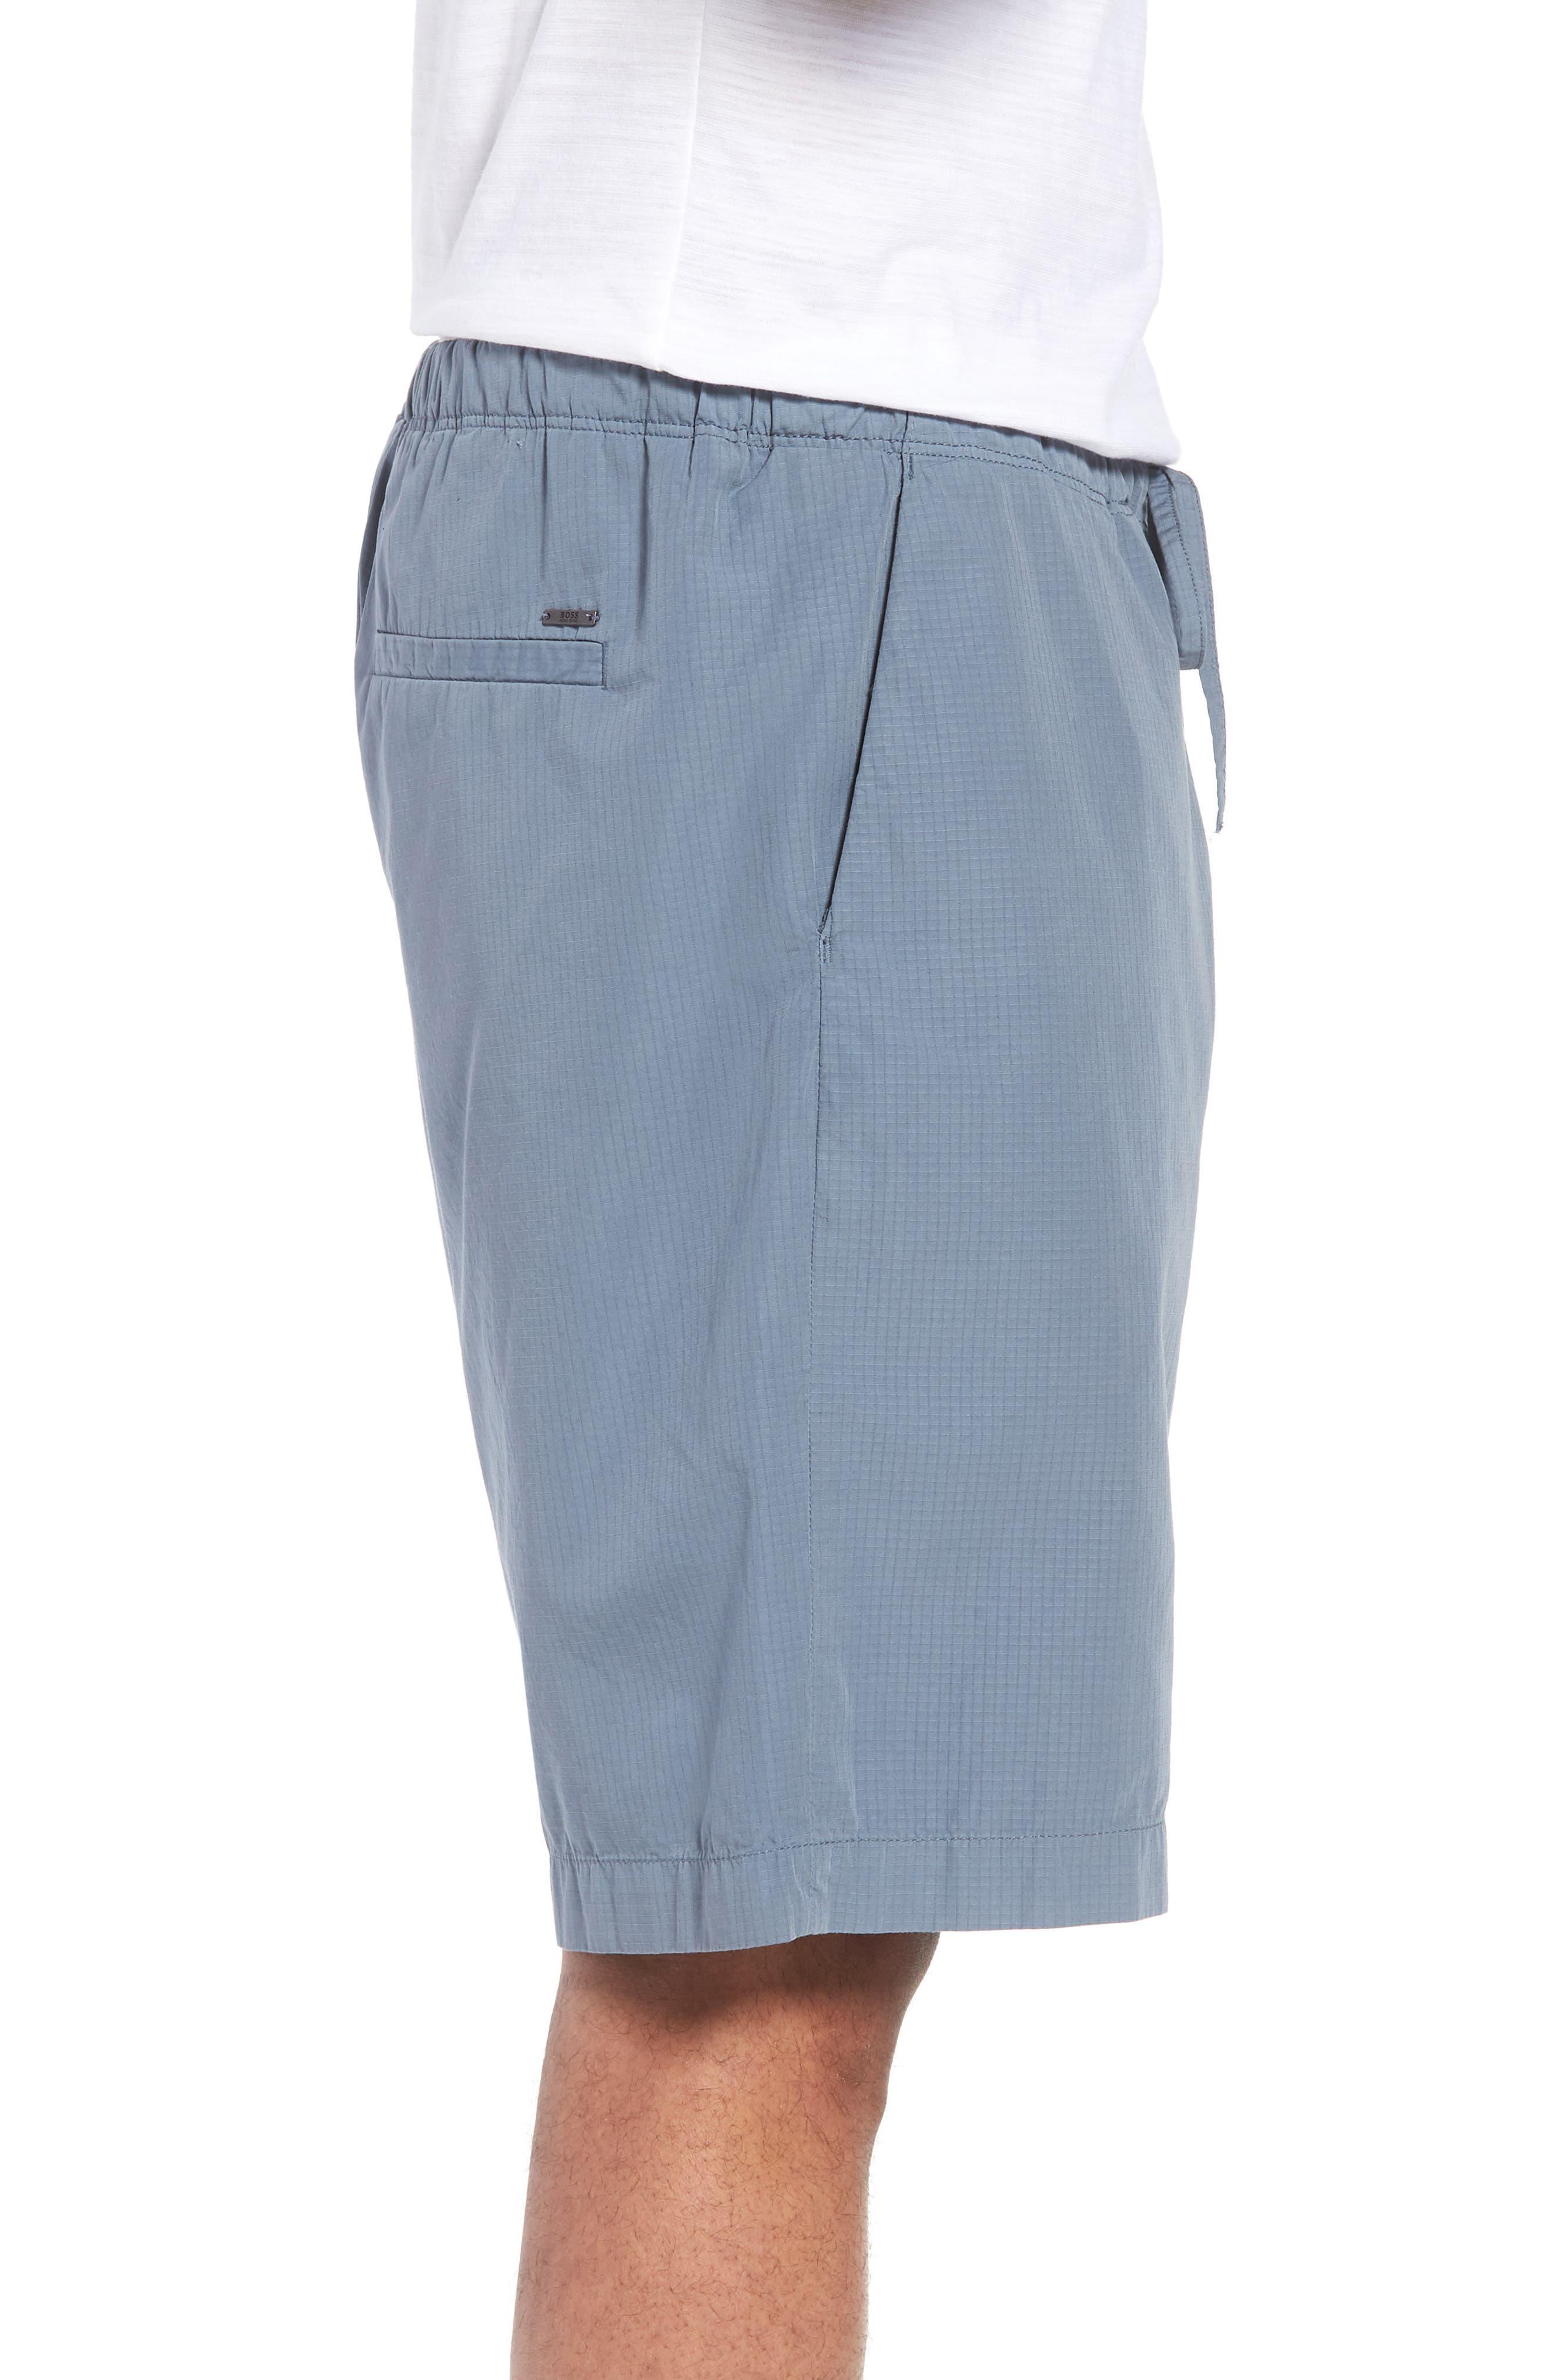 Passeo Cotton Shorts,                             Alternate thumbnail 3, color,                             GREY